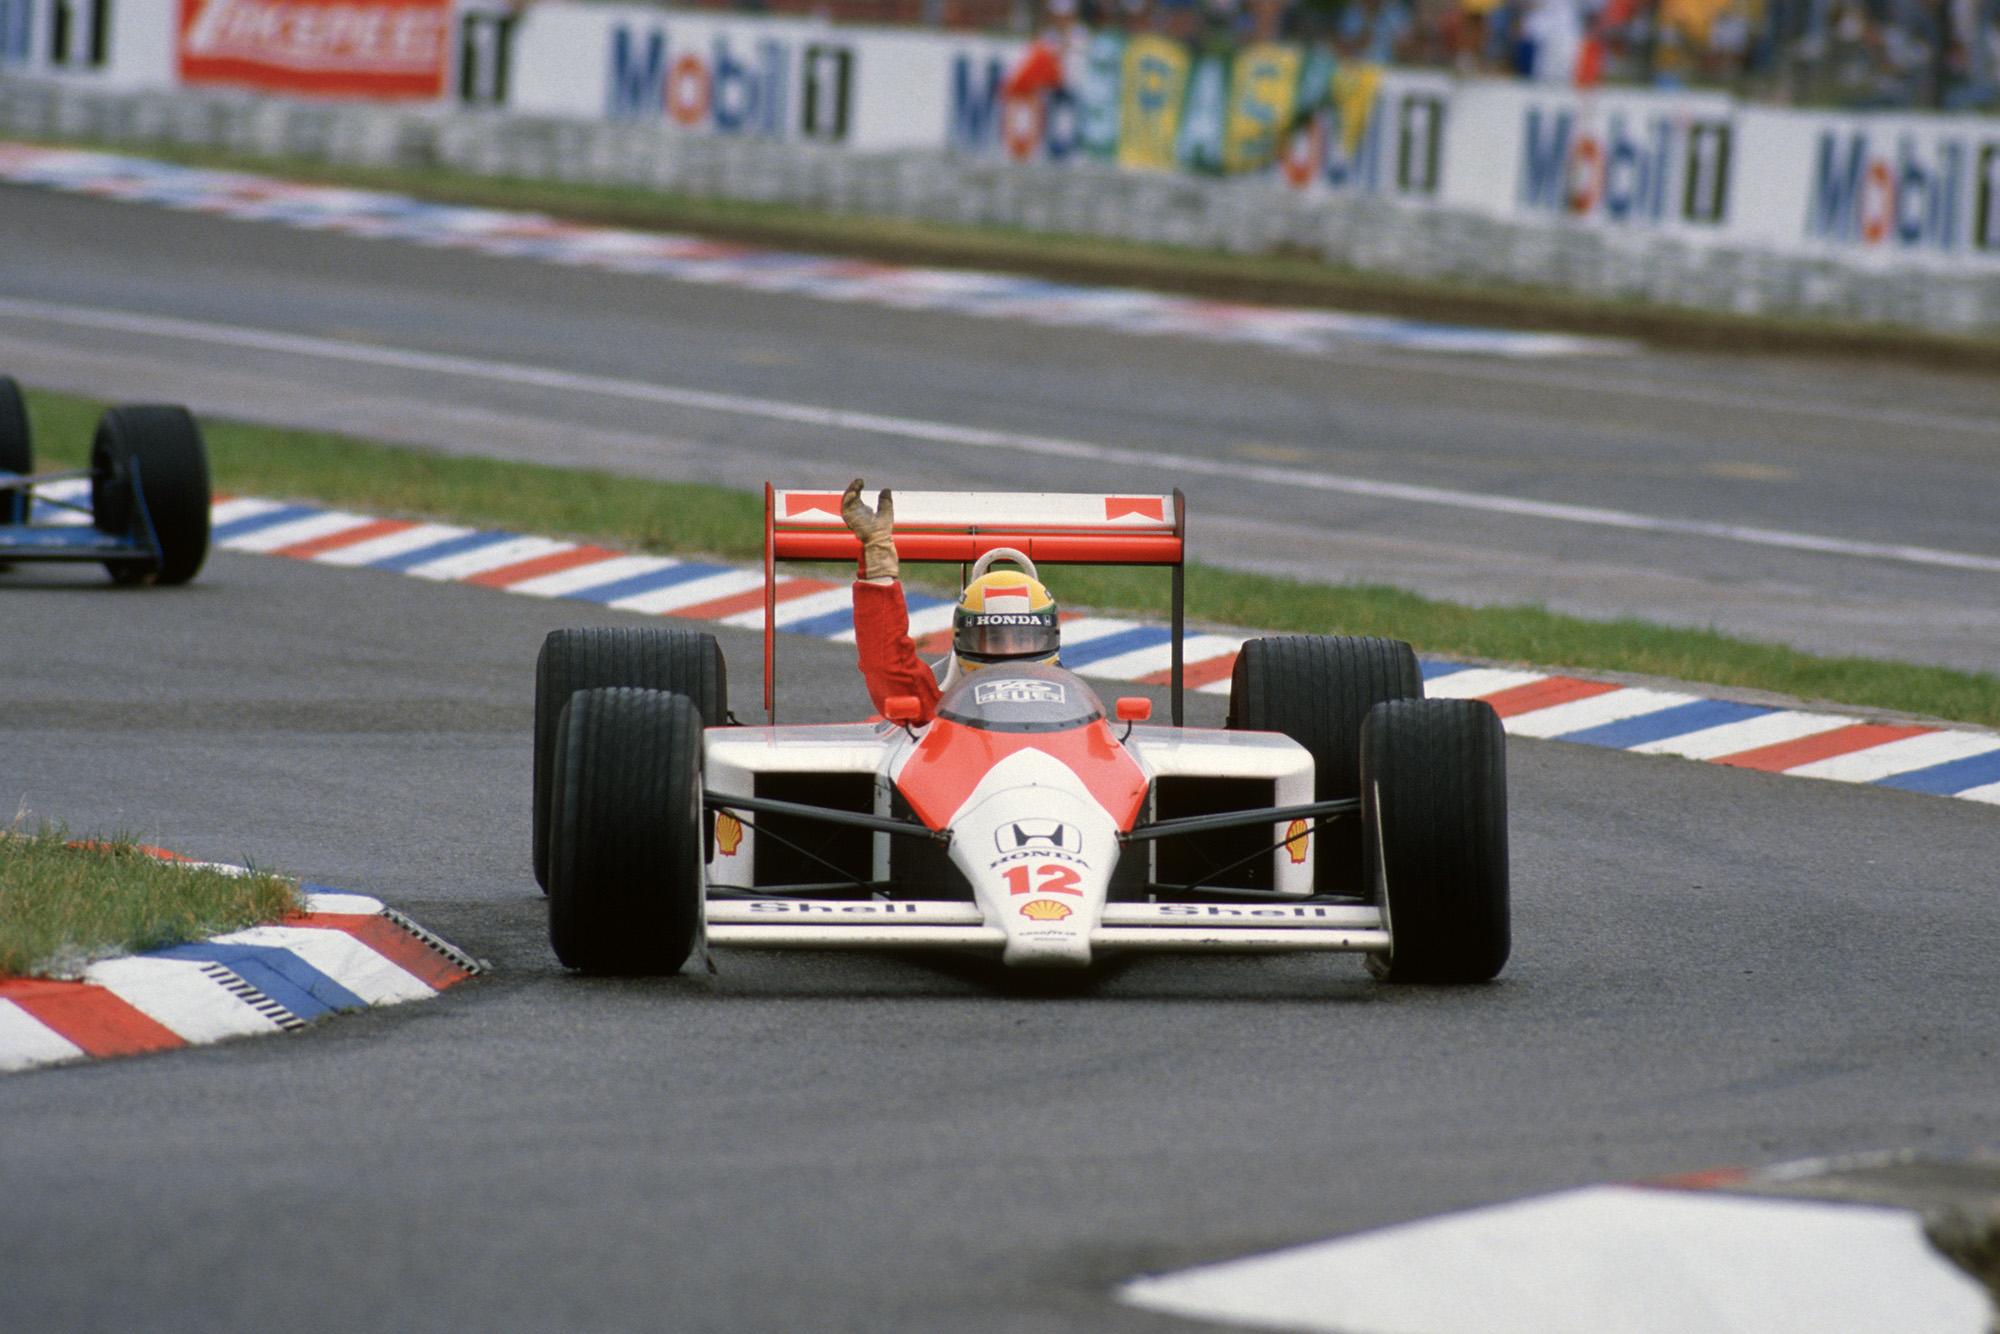 Ayrton Senna waves to fans from his McLaren Honda after winning the 1988 German Grand Prix